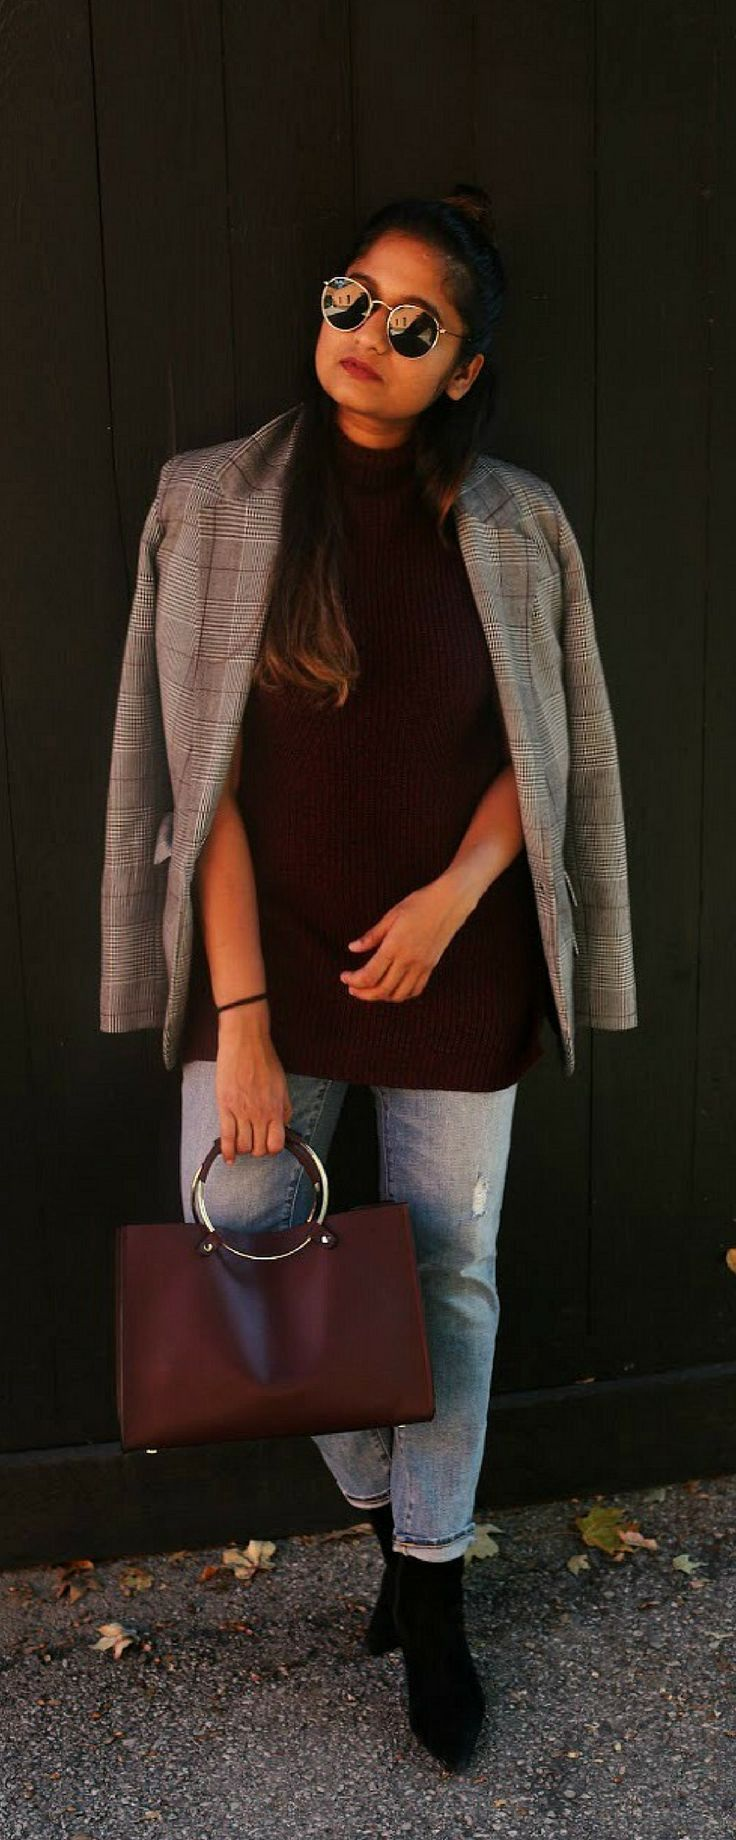 Sleveless turtleneck sweater plaid blazer girlfriend jeans and